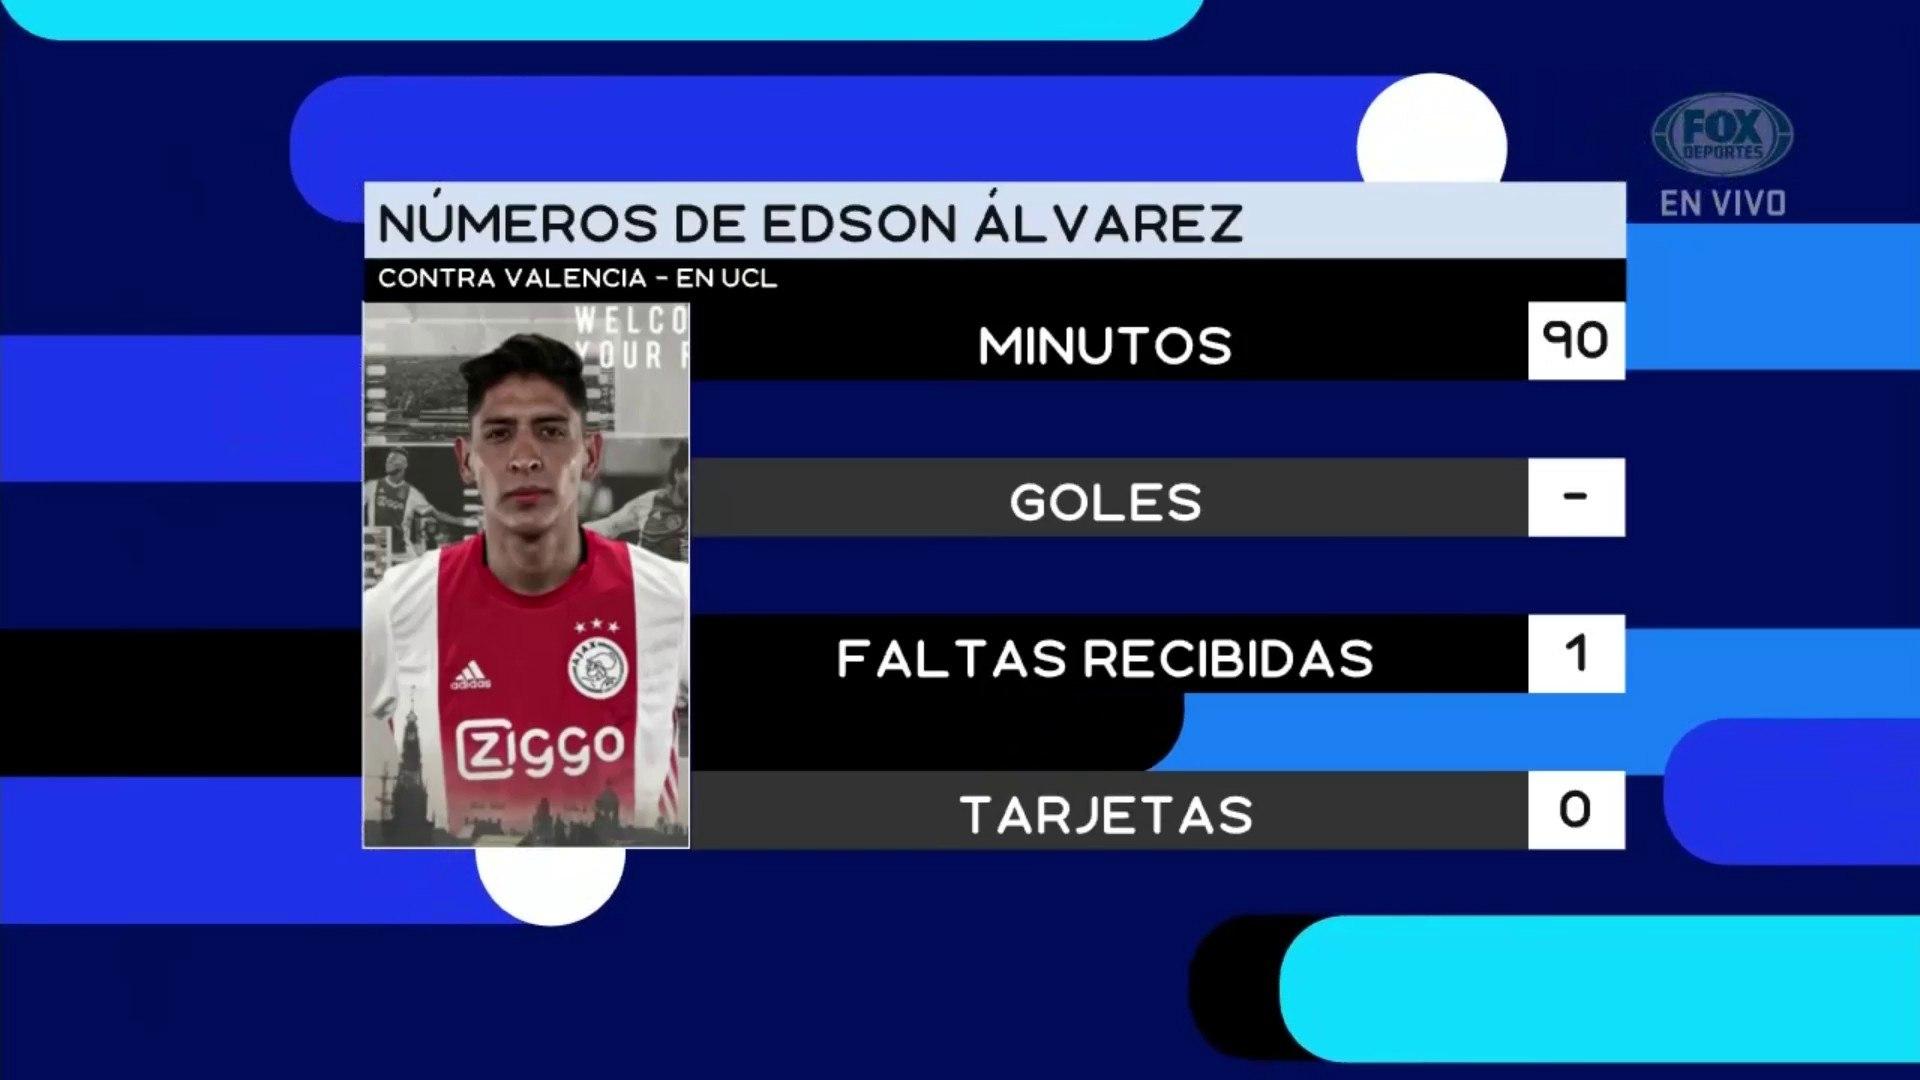 FOX Sports Radio: El sorprendente Ajax de Edson Álvarez